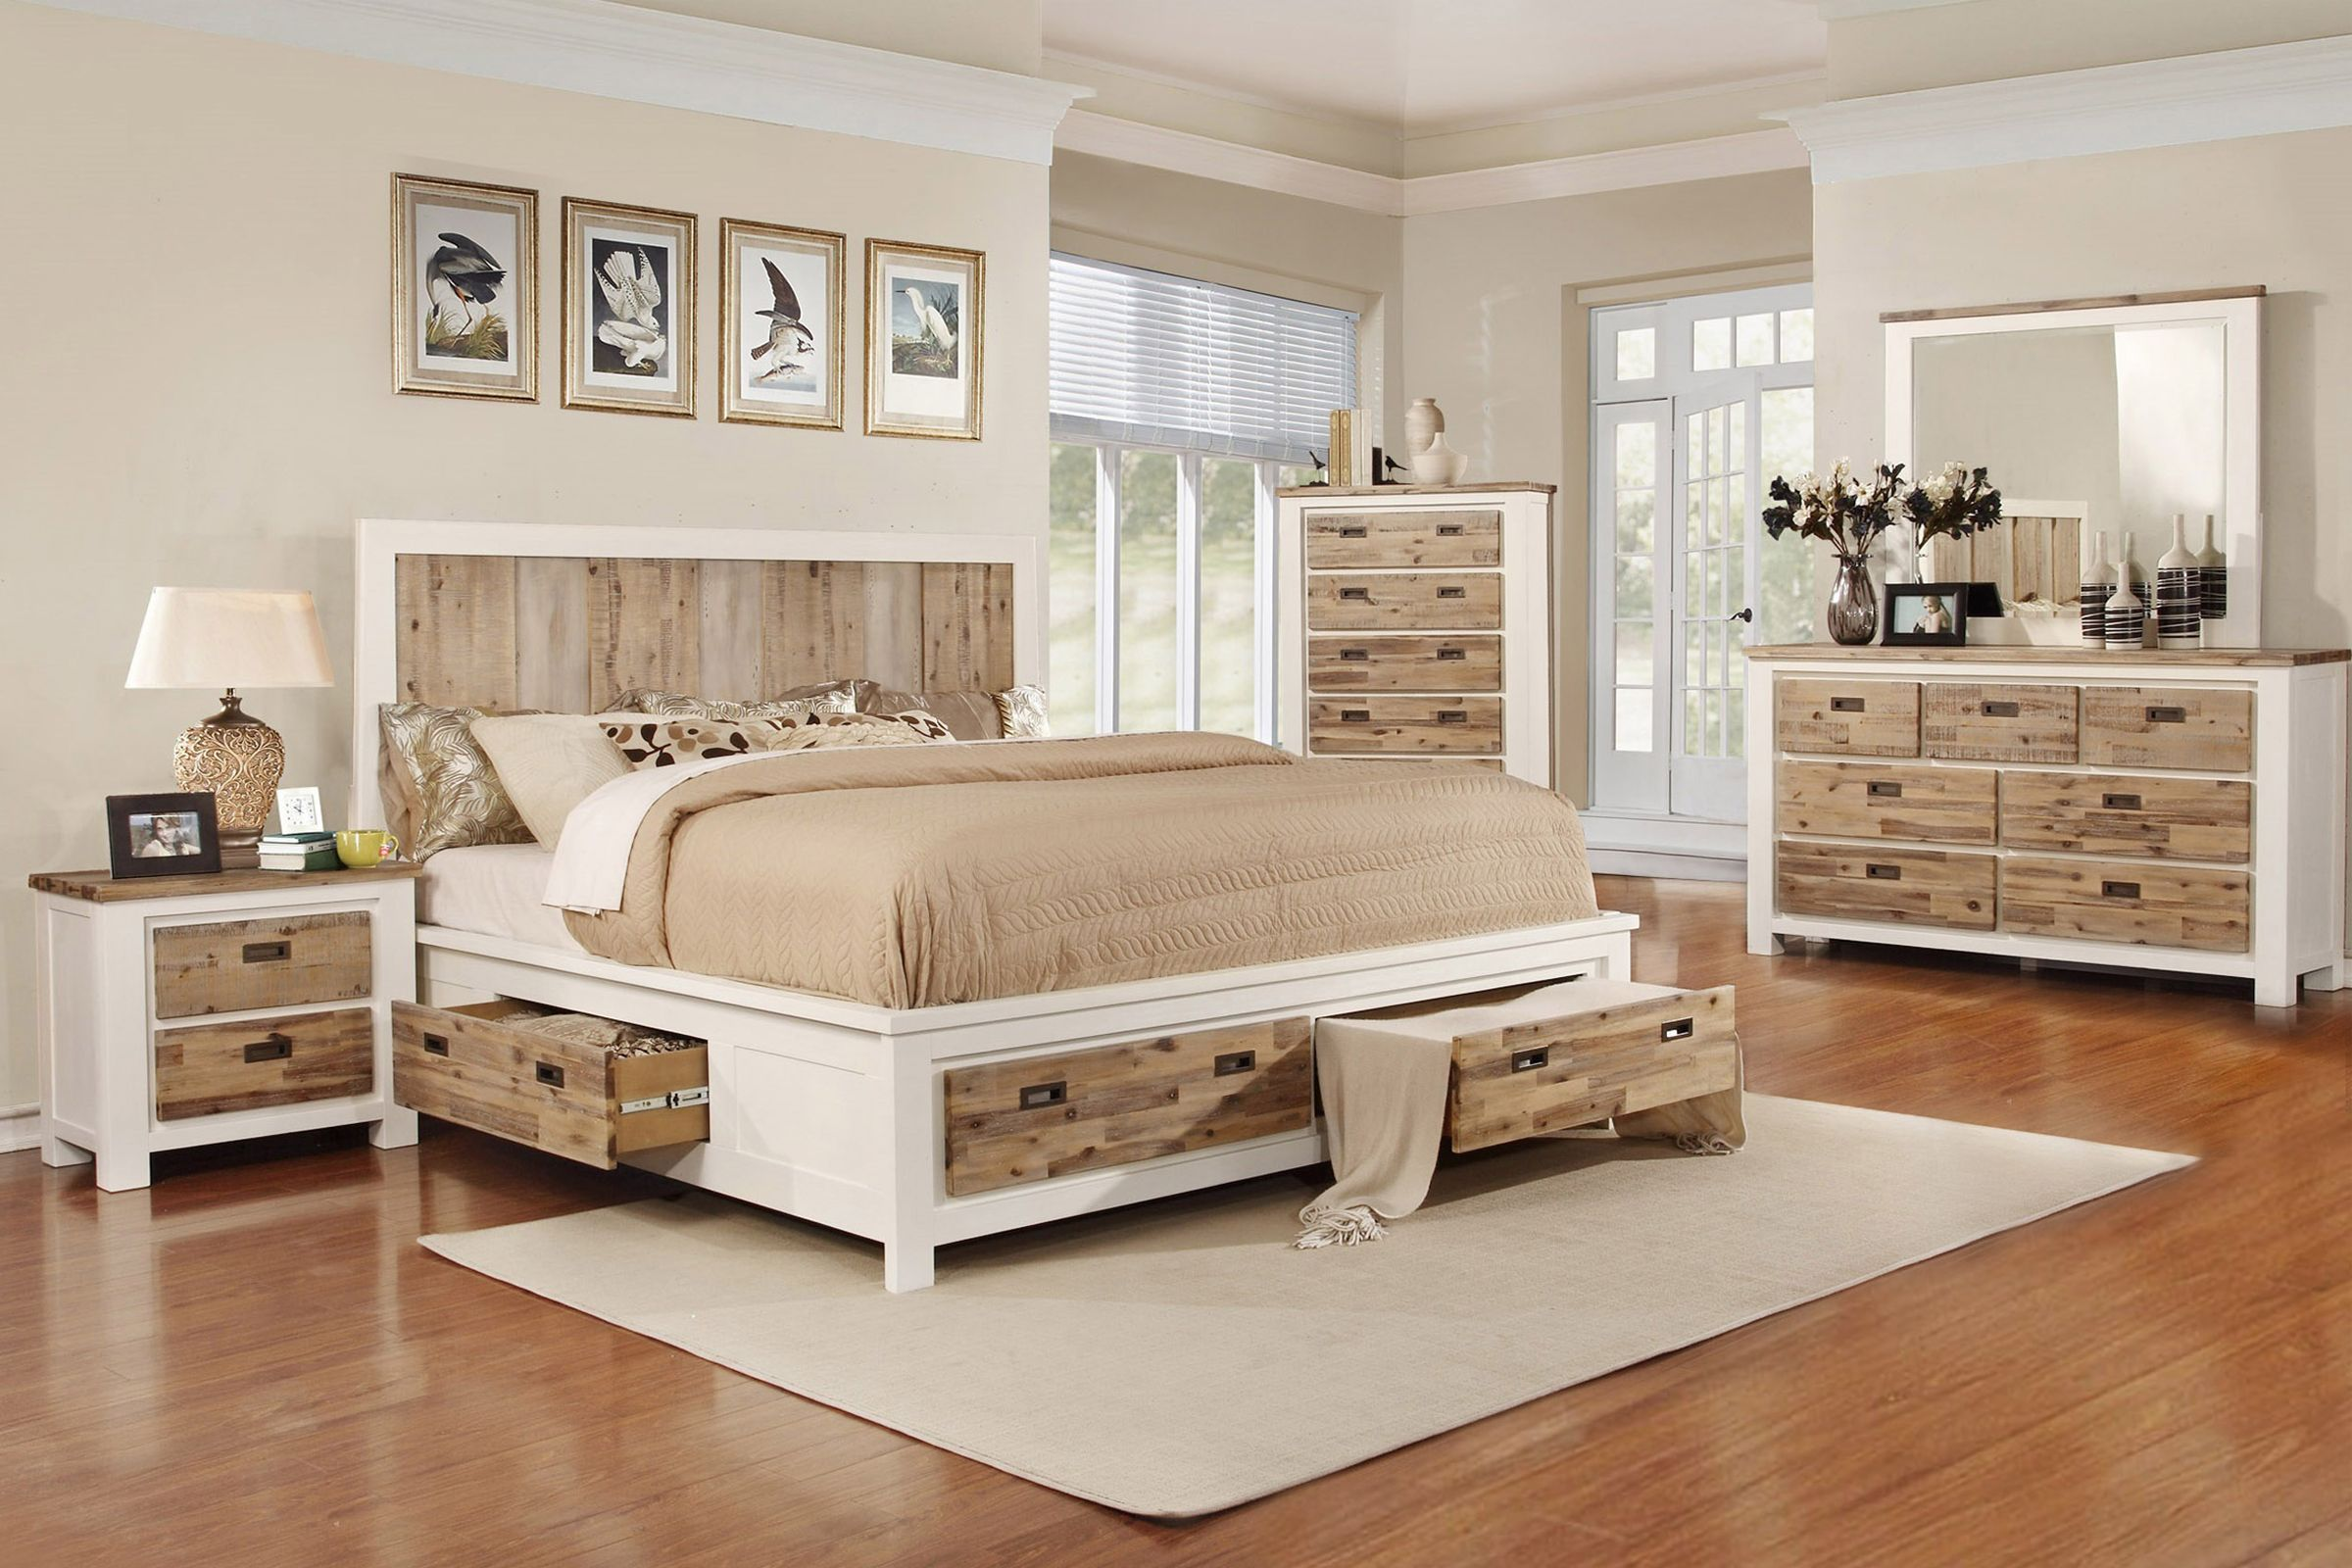 Western 5-Piece King Bedroom Set